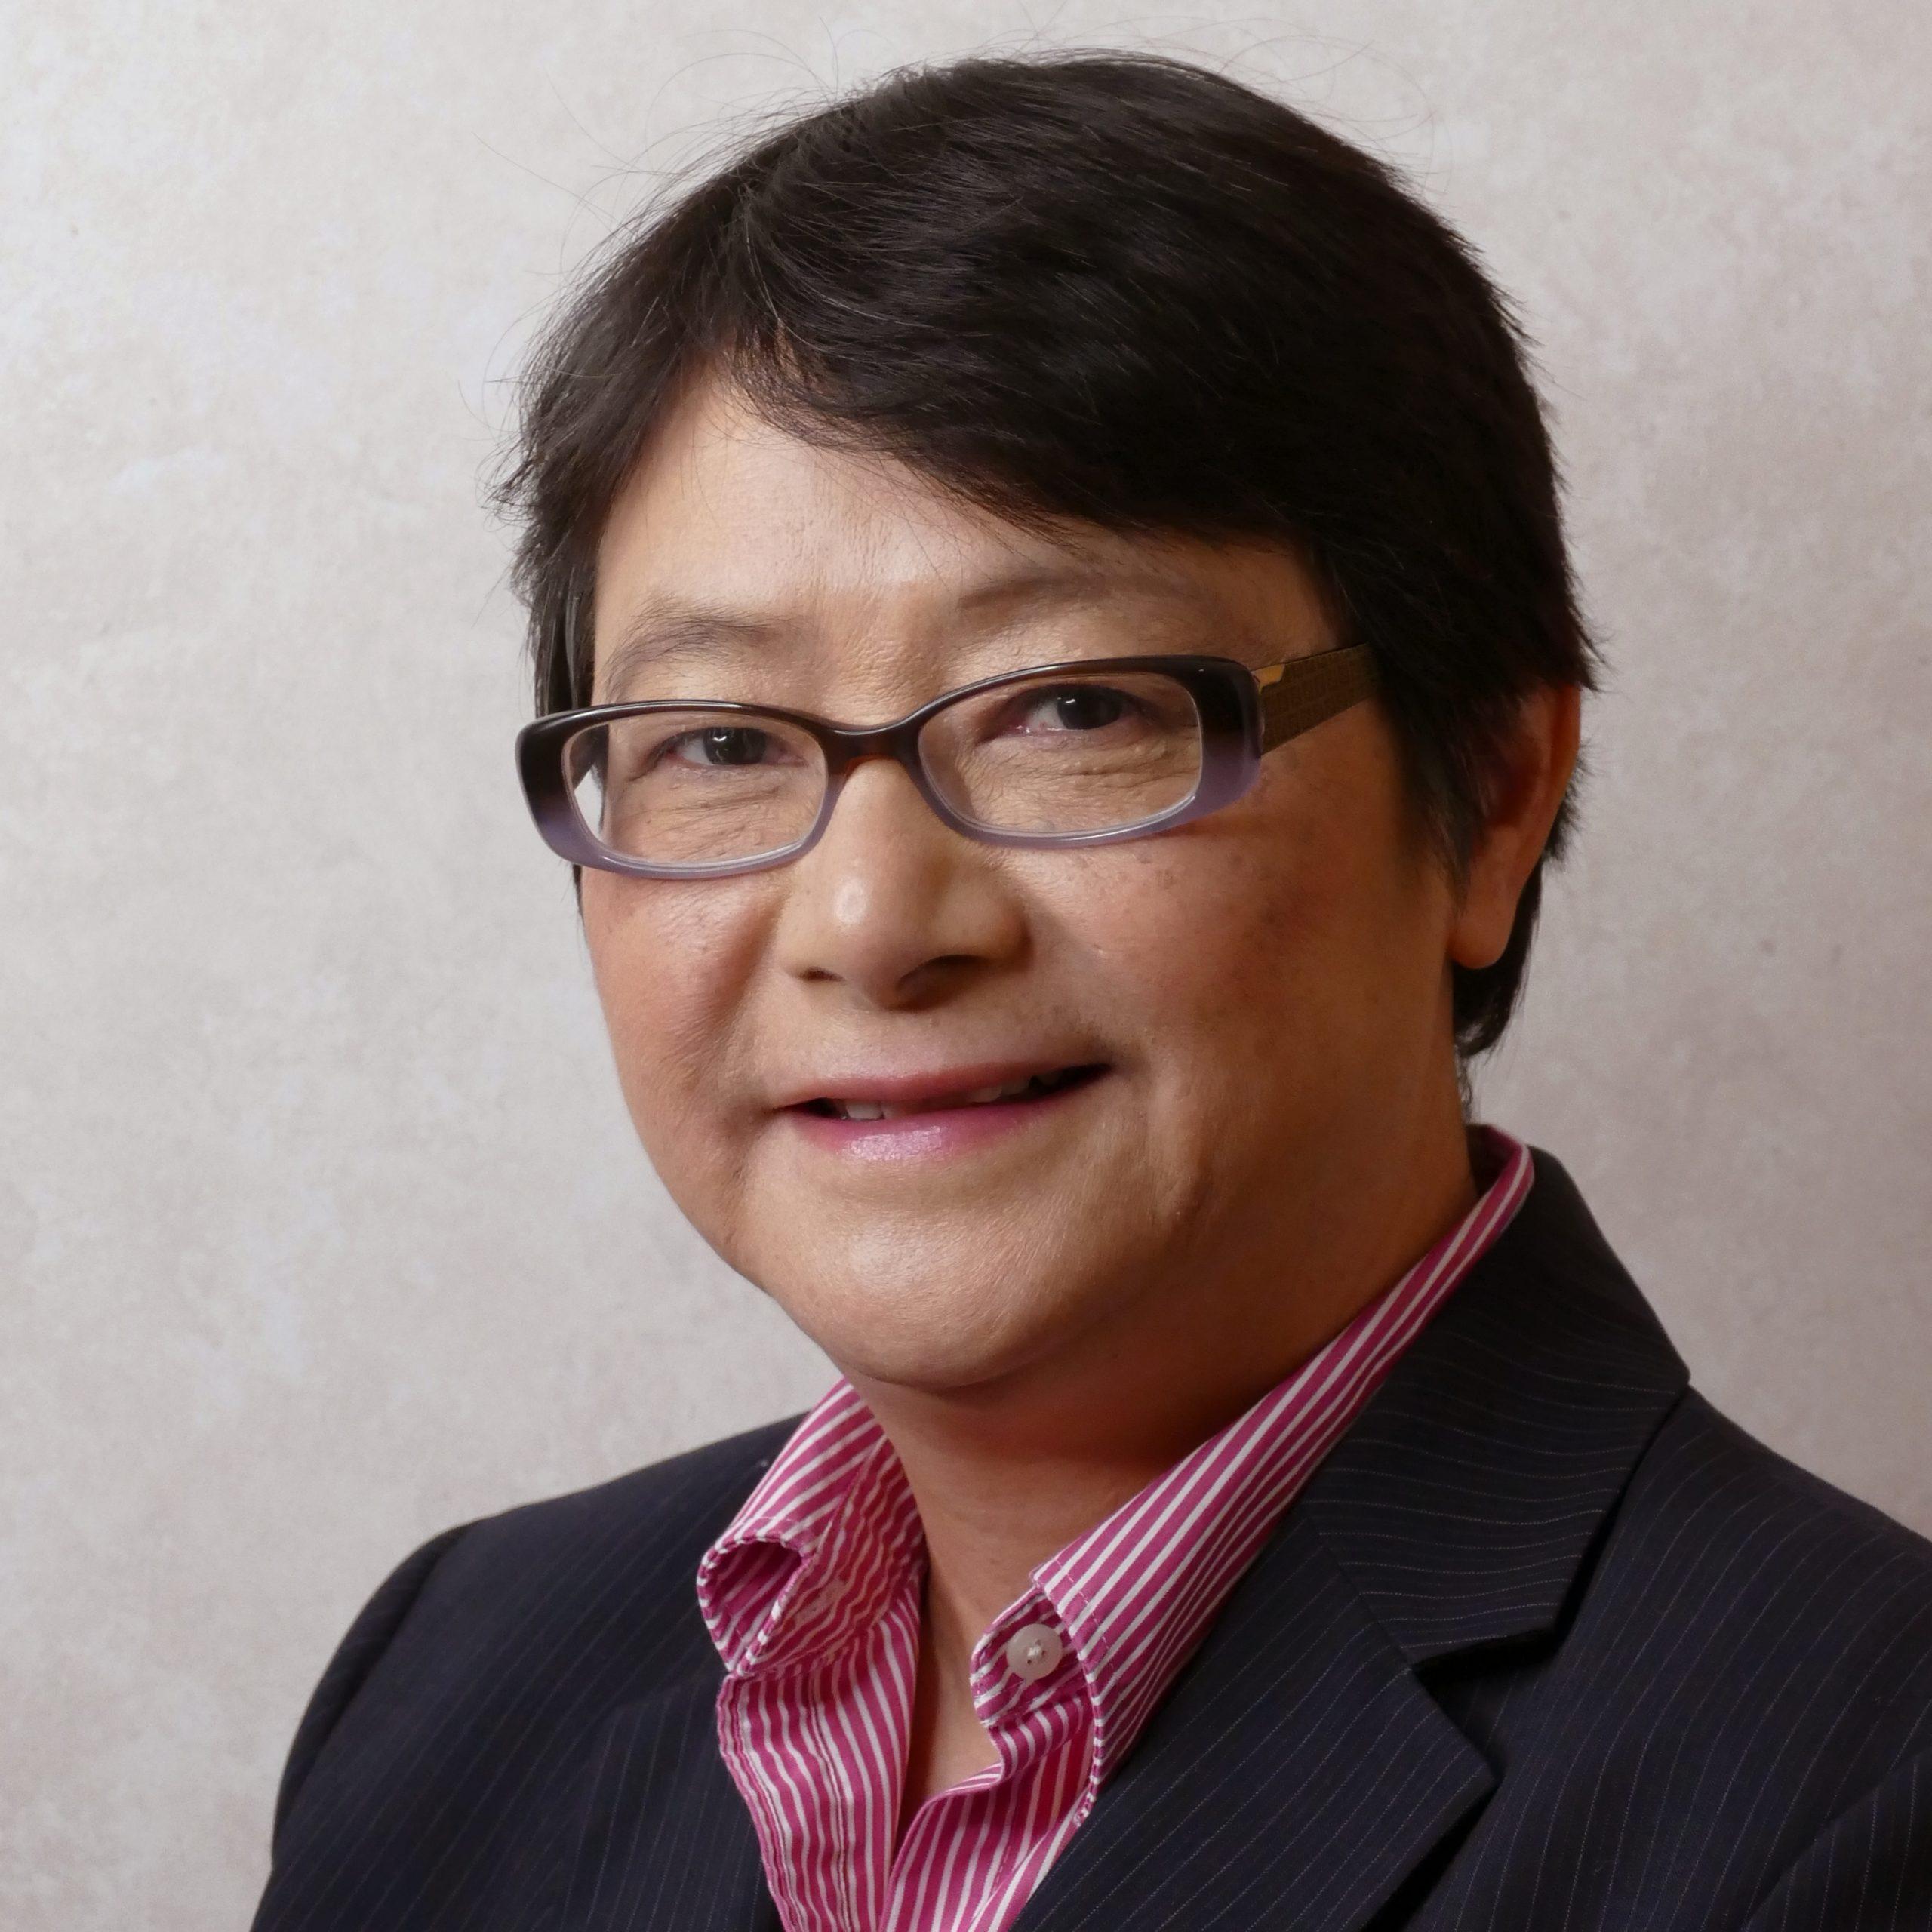 Yan Cheung, Principal